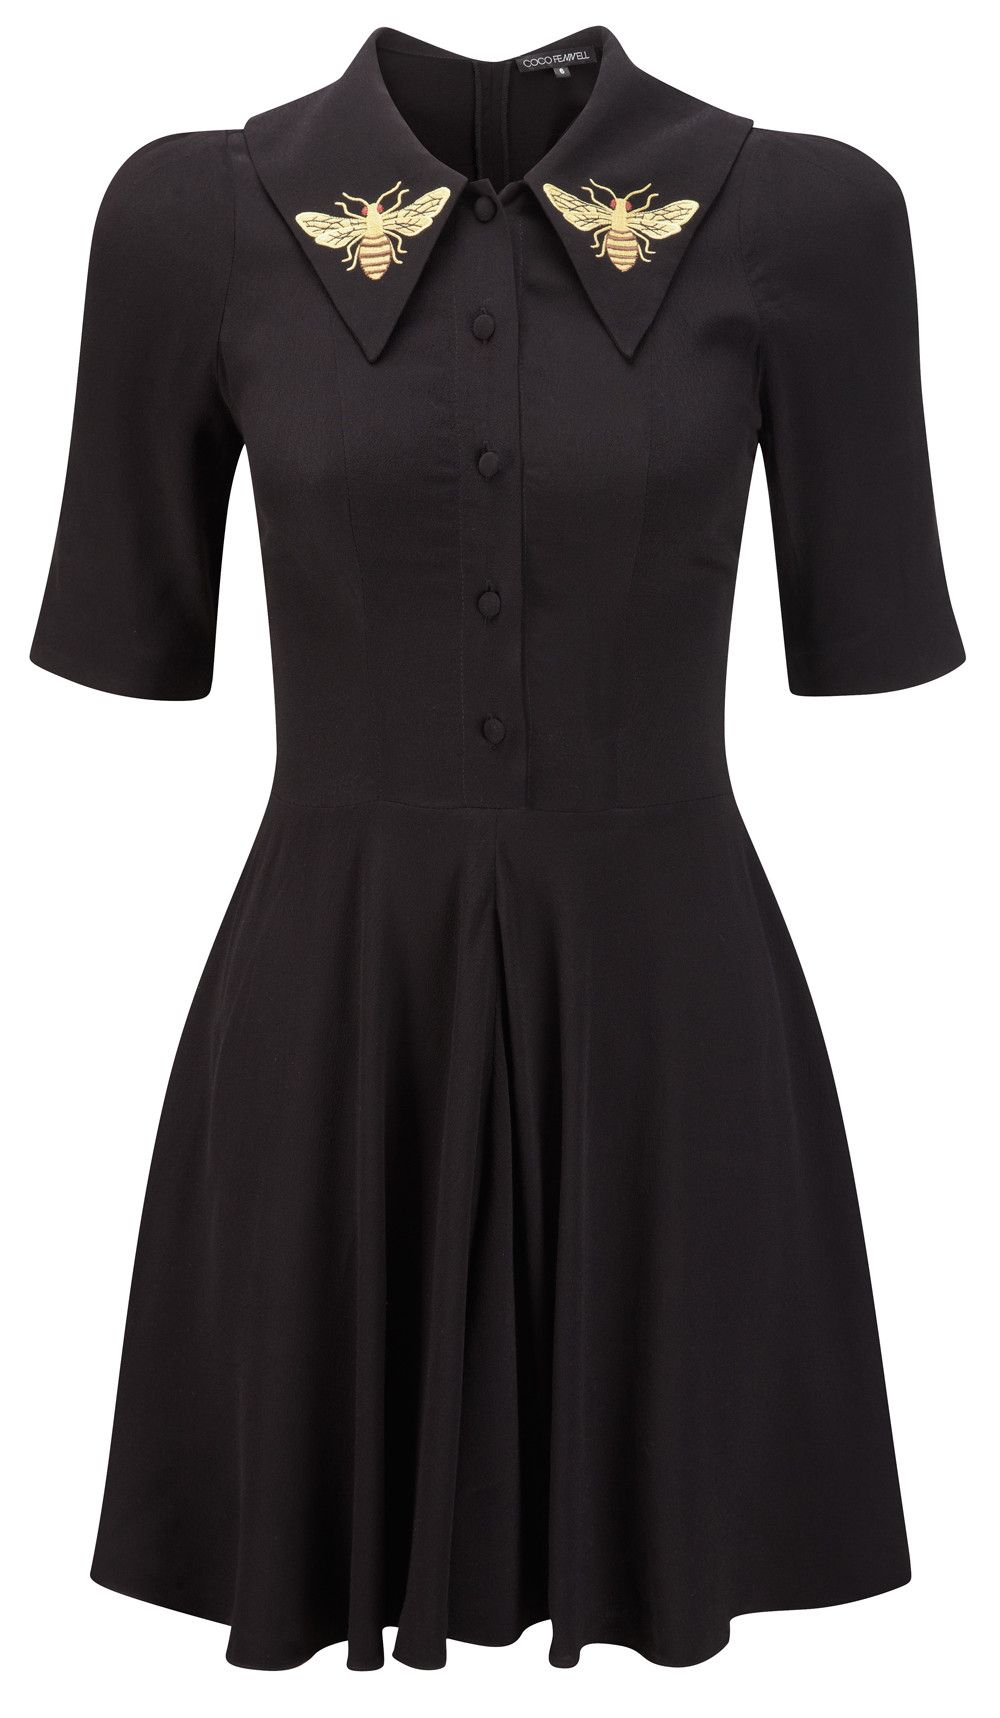 80d45ac5c06 Black Bee Dress